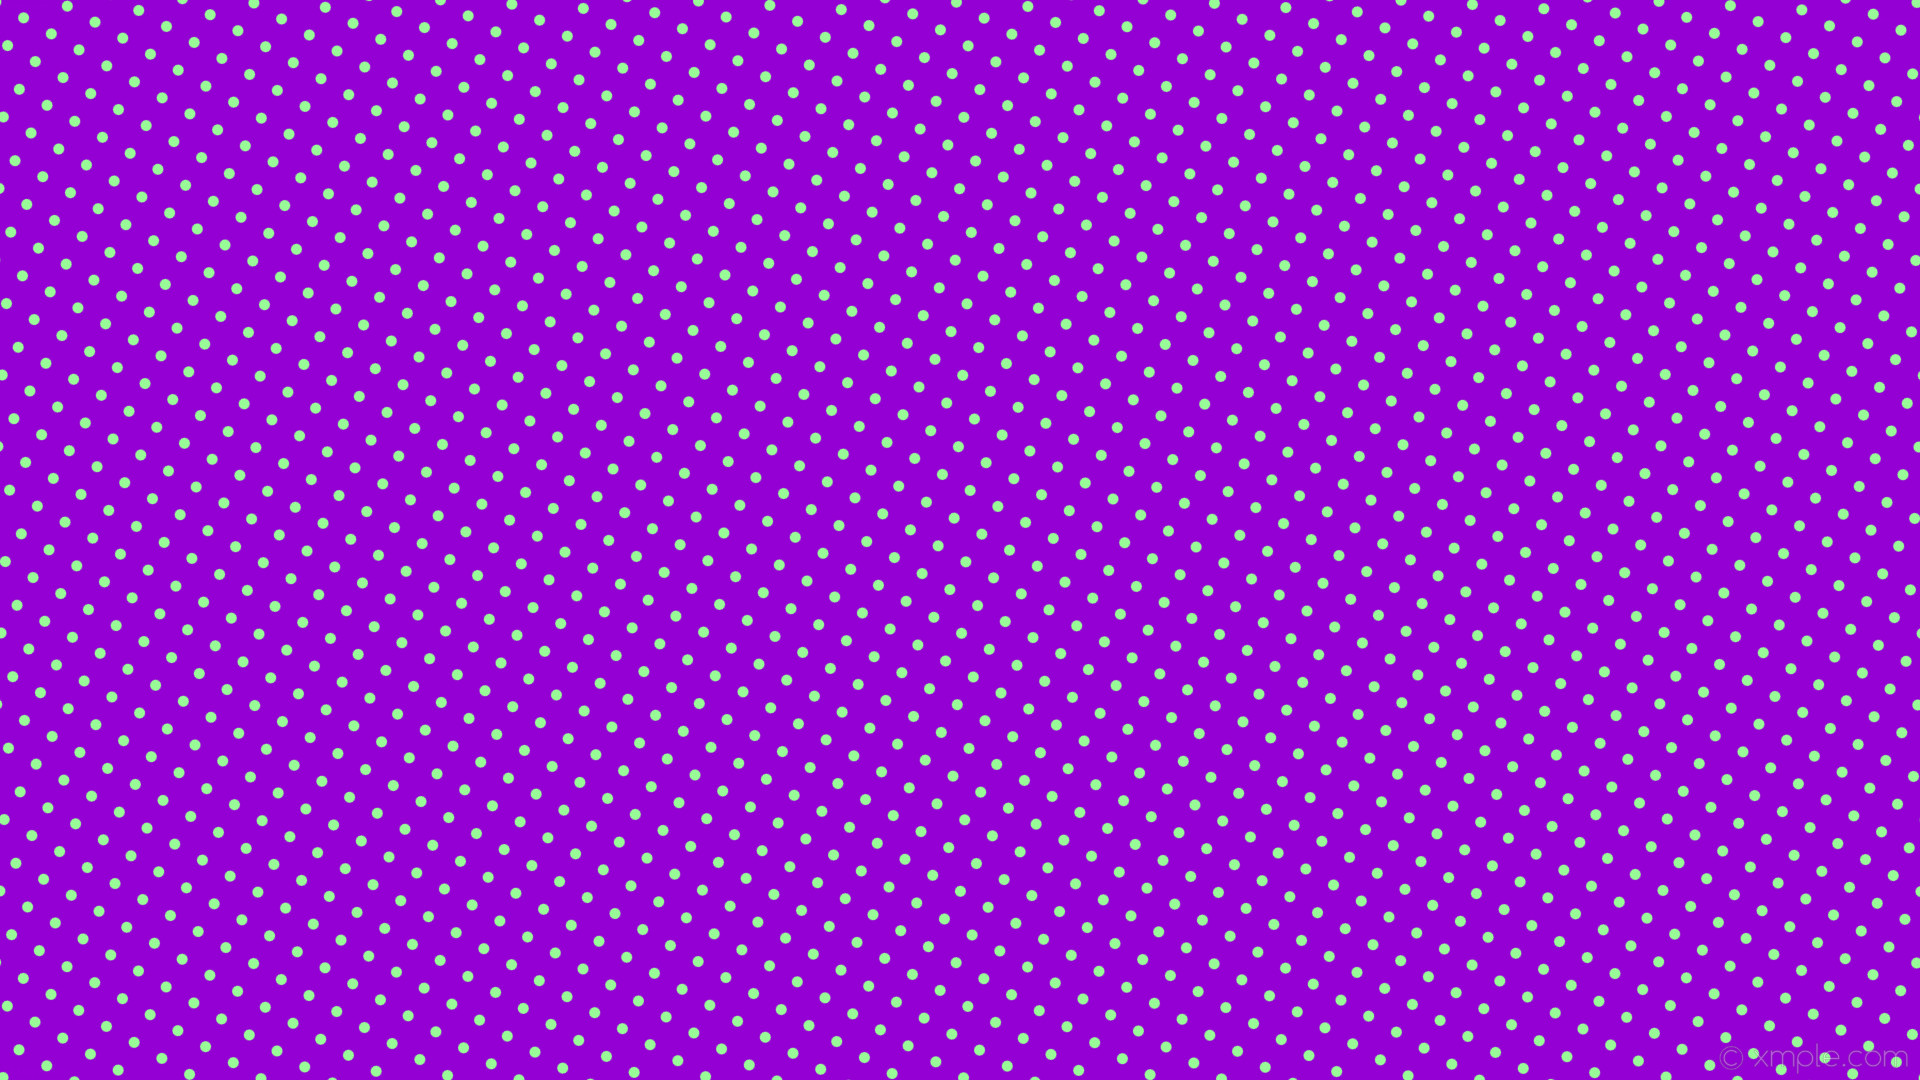 wallpaper spots purple green polka dots dark violet pale green #9400d3  #98fb98 330°